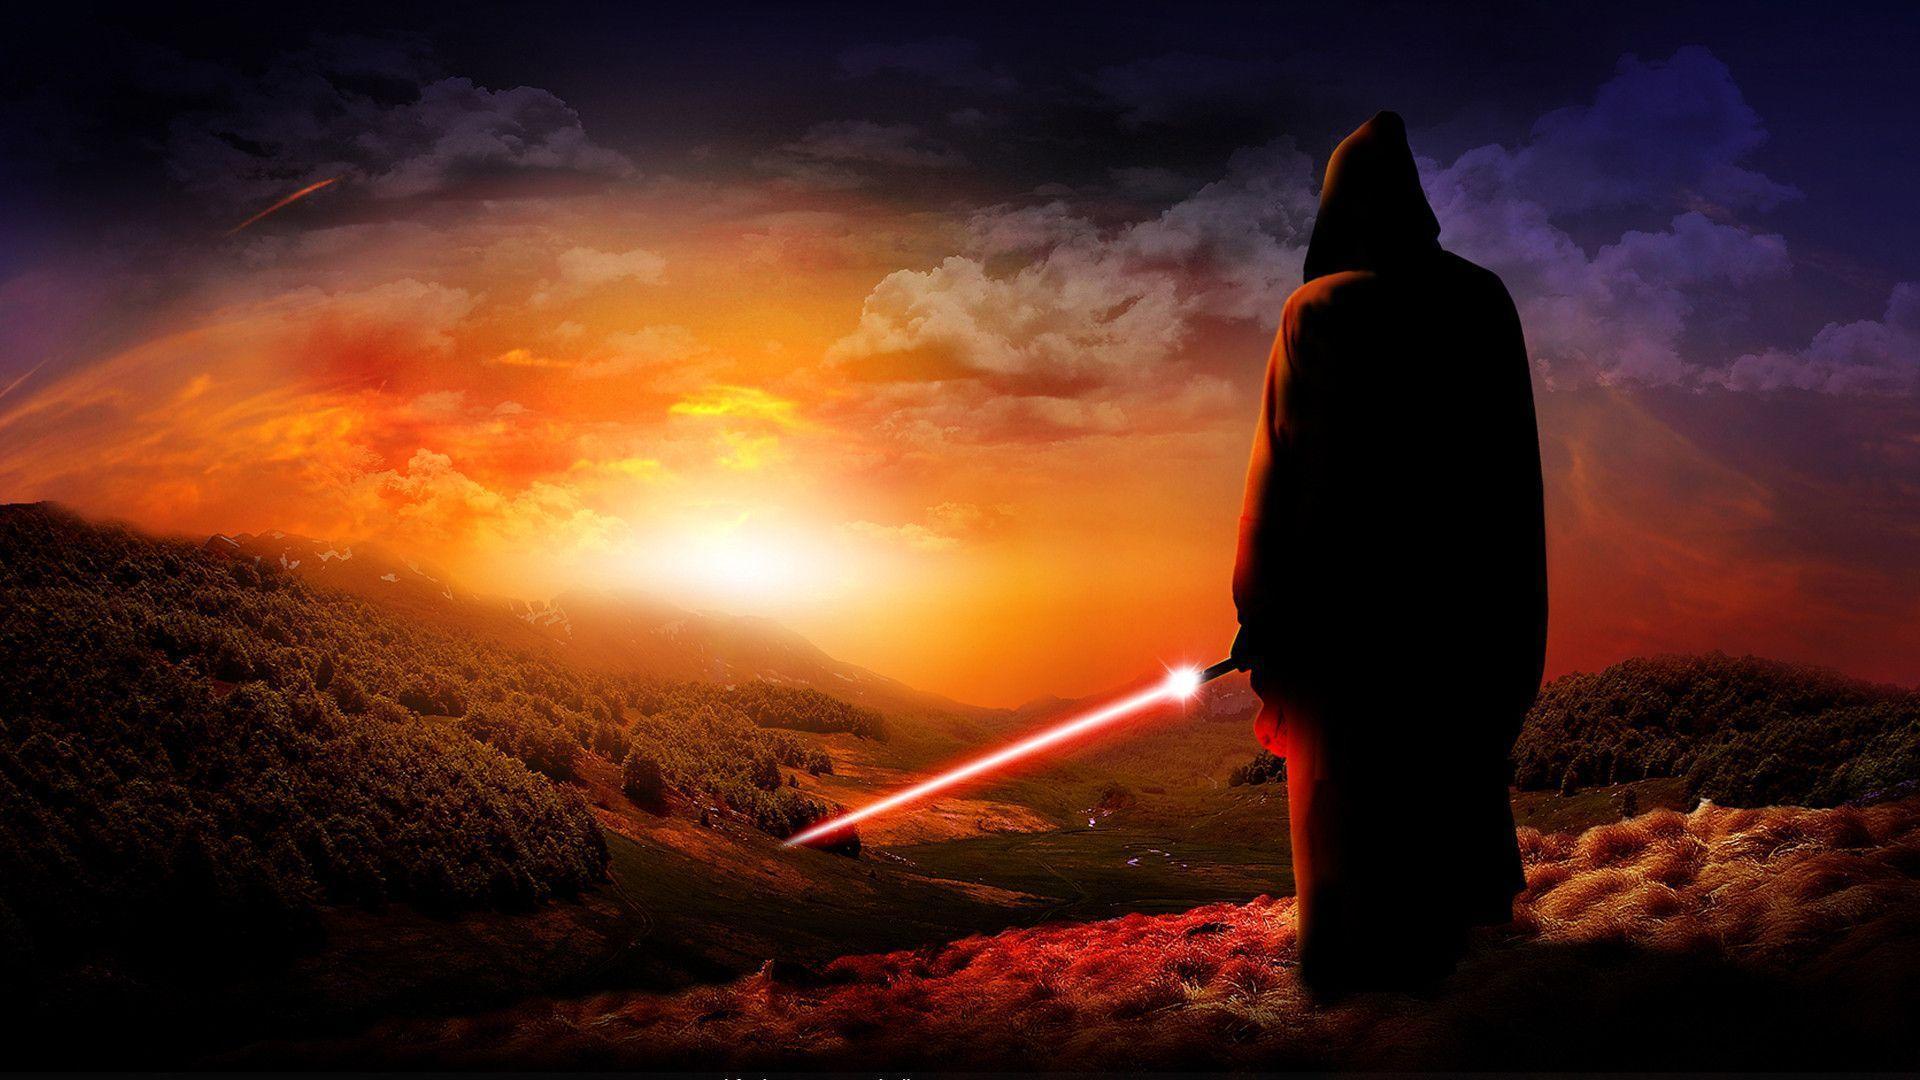 Star Wars Jedi Hill Wallpaper IPhone Facebook Cover